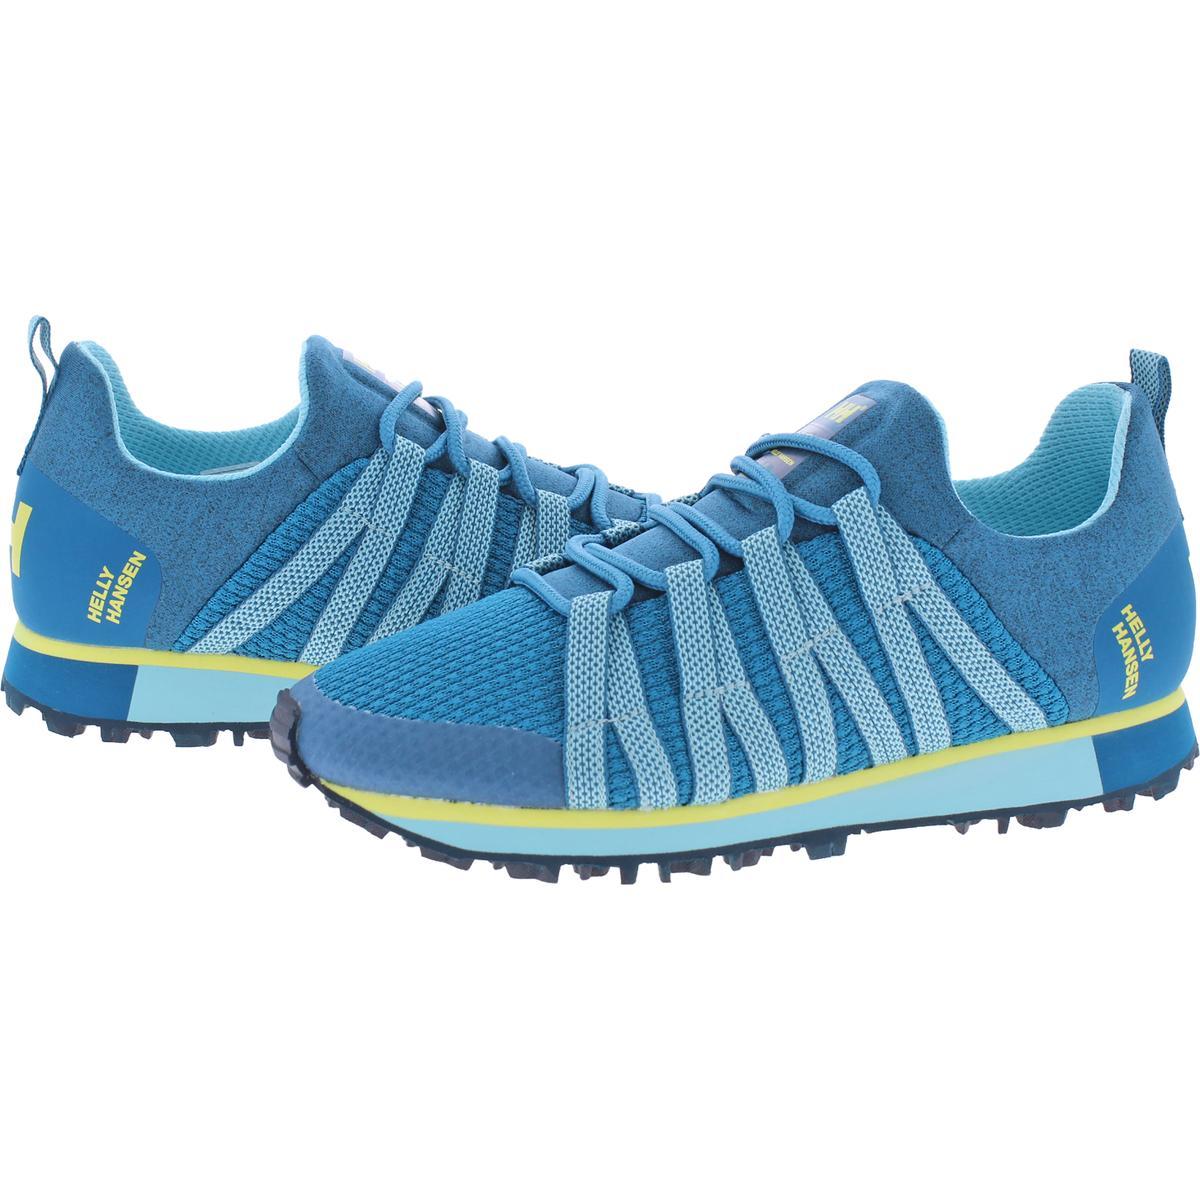 thumbnail 9 - Helly-Hansen-Womens-Vardapeak-V2-Fitness-Performance-Sneakers-Shoes-BHFO-9846